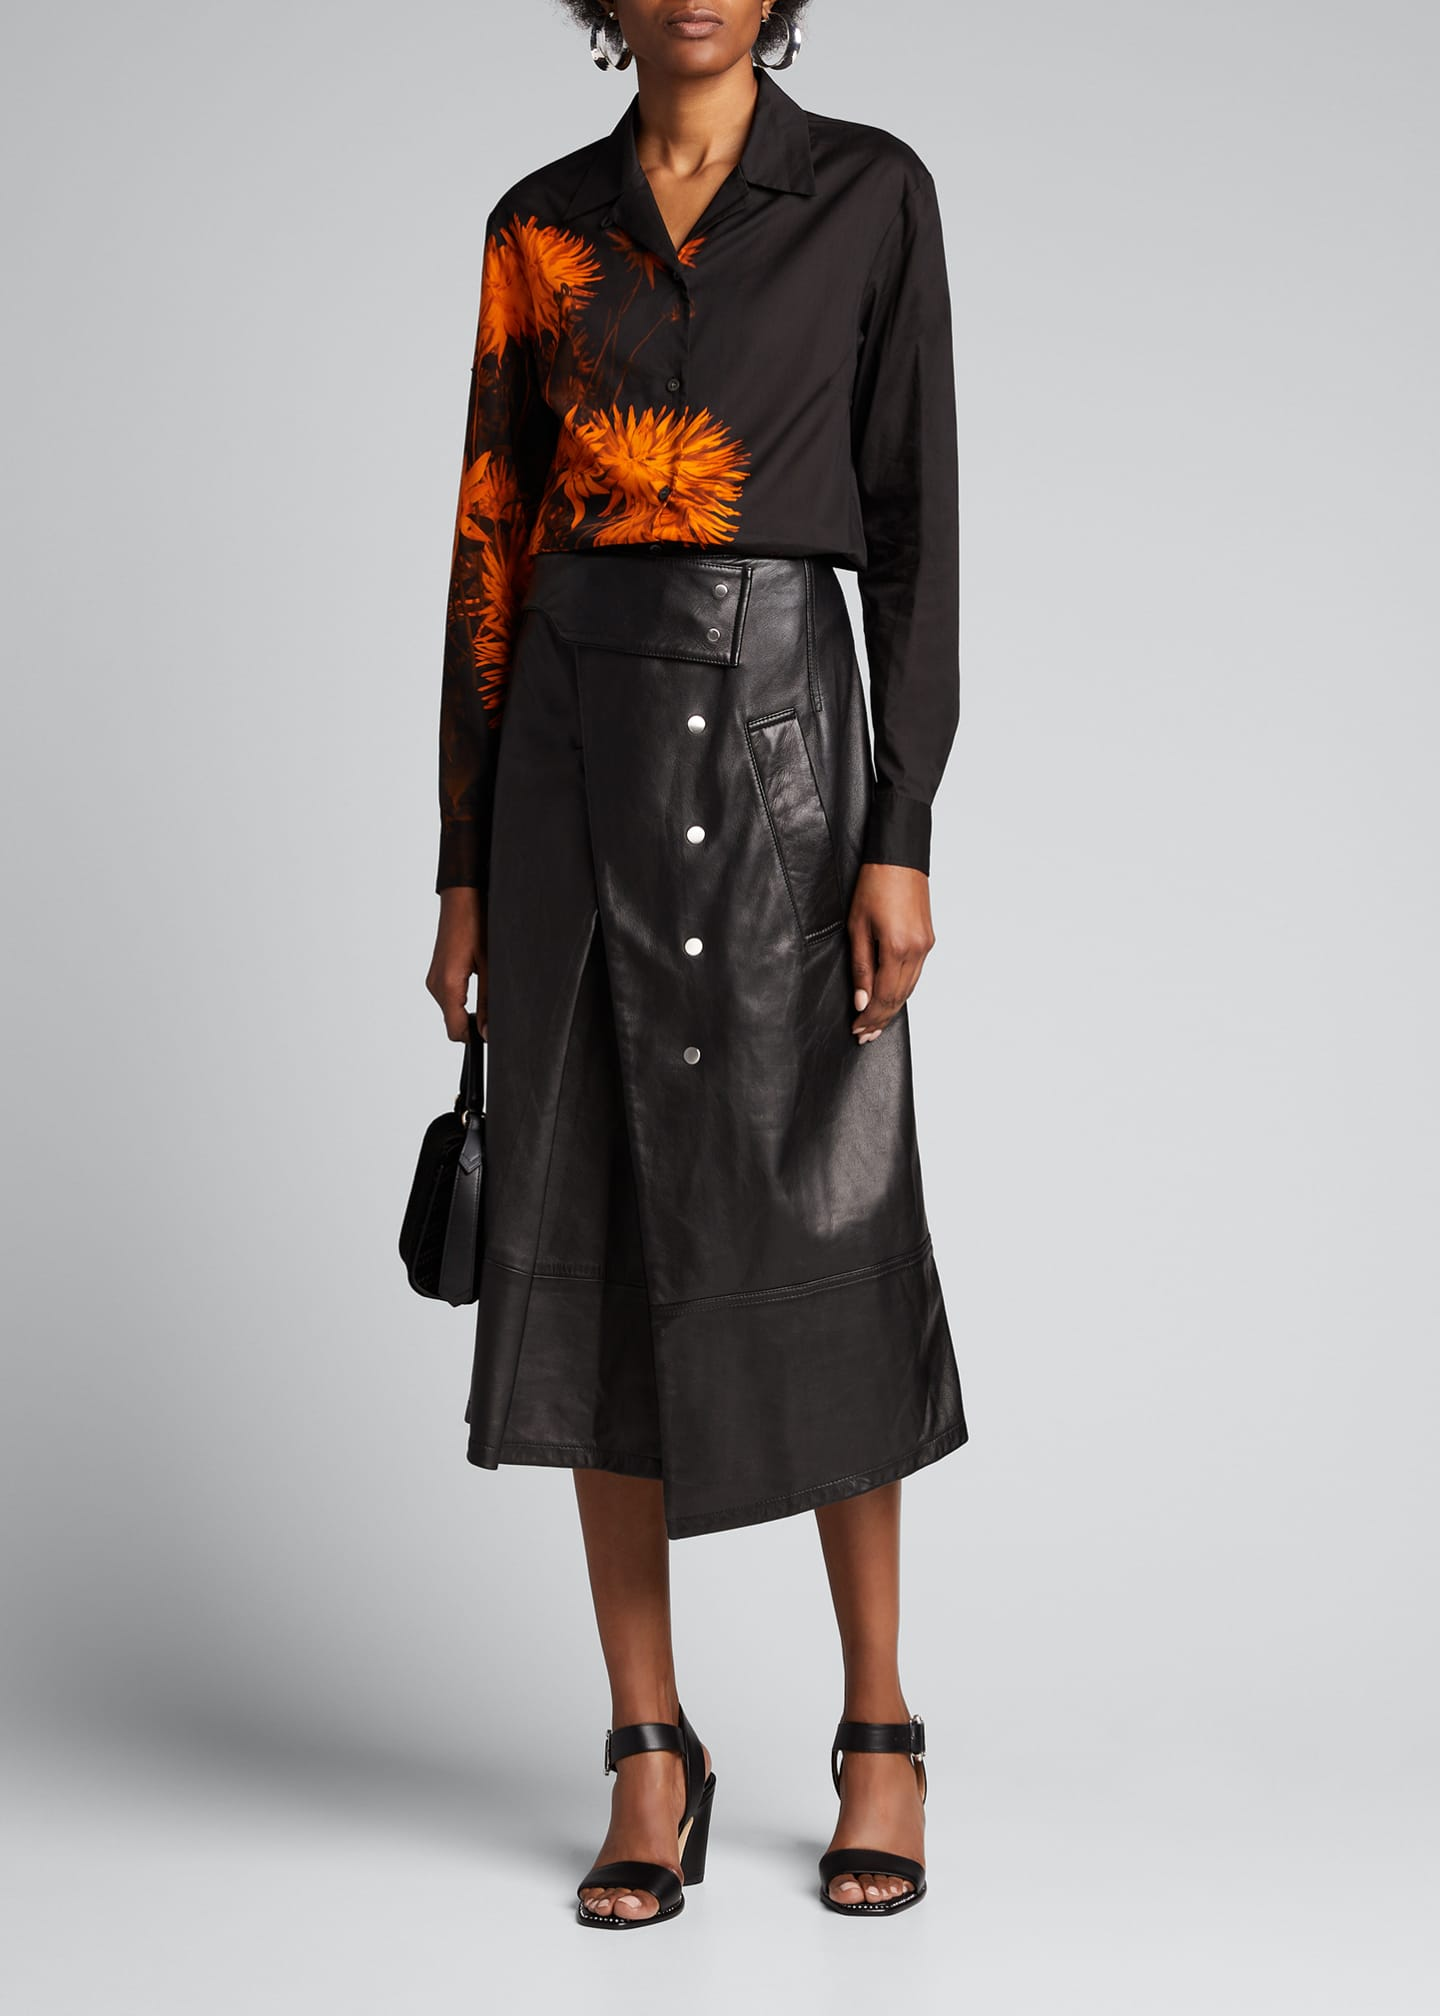 Dries Van Noten Floral-Print Georgette Button-Front Shirt